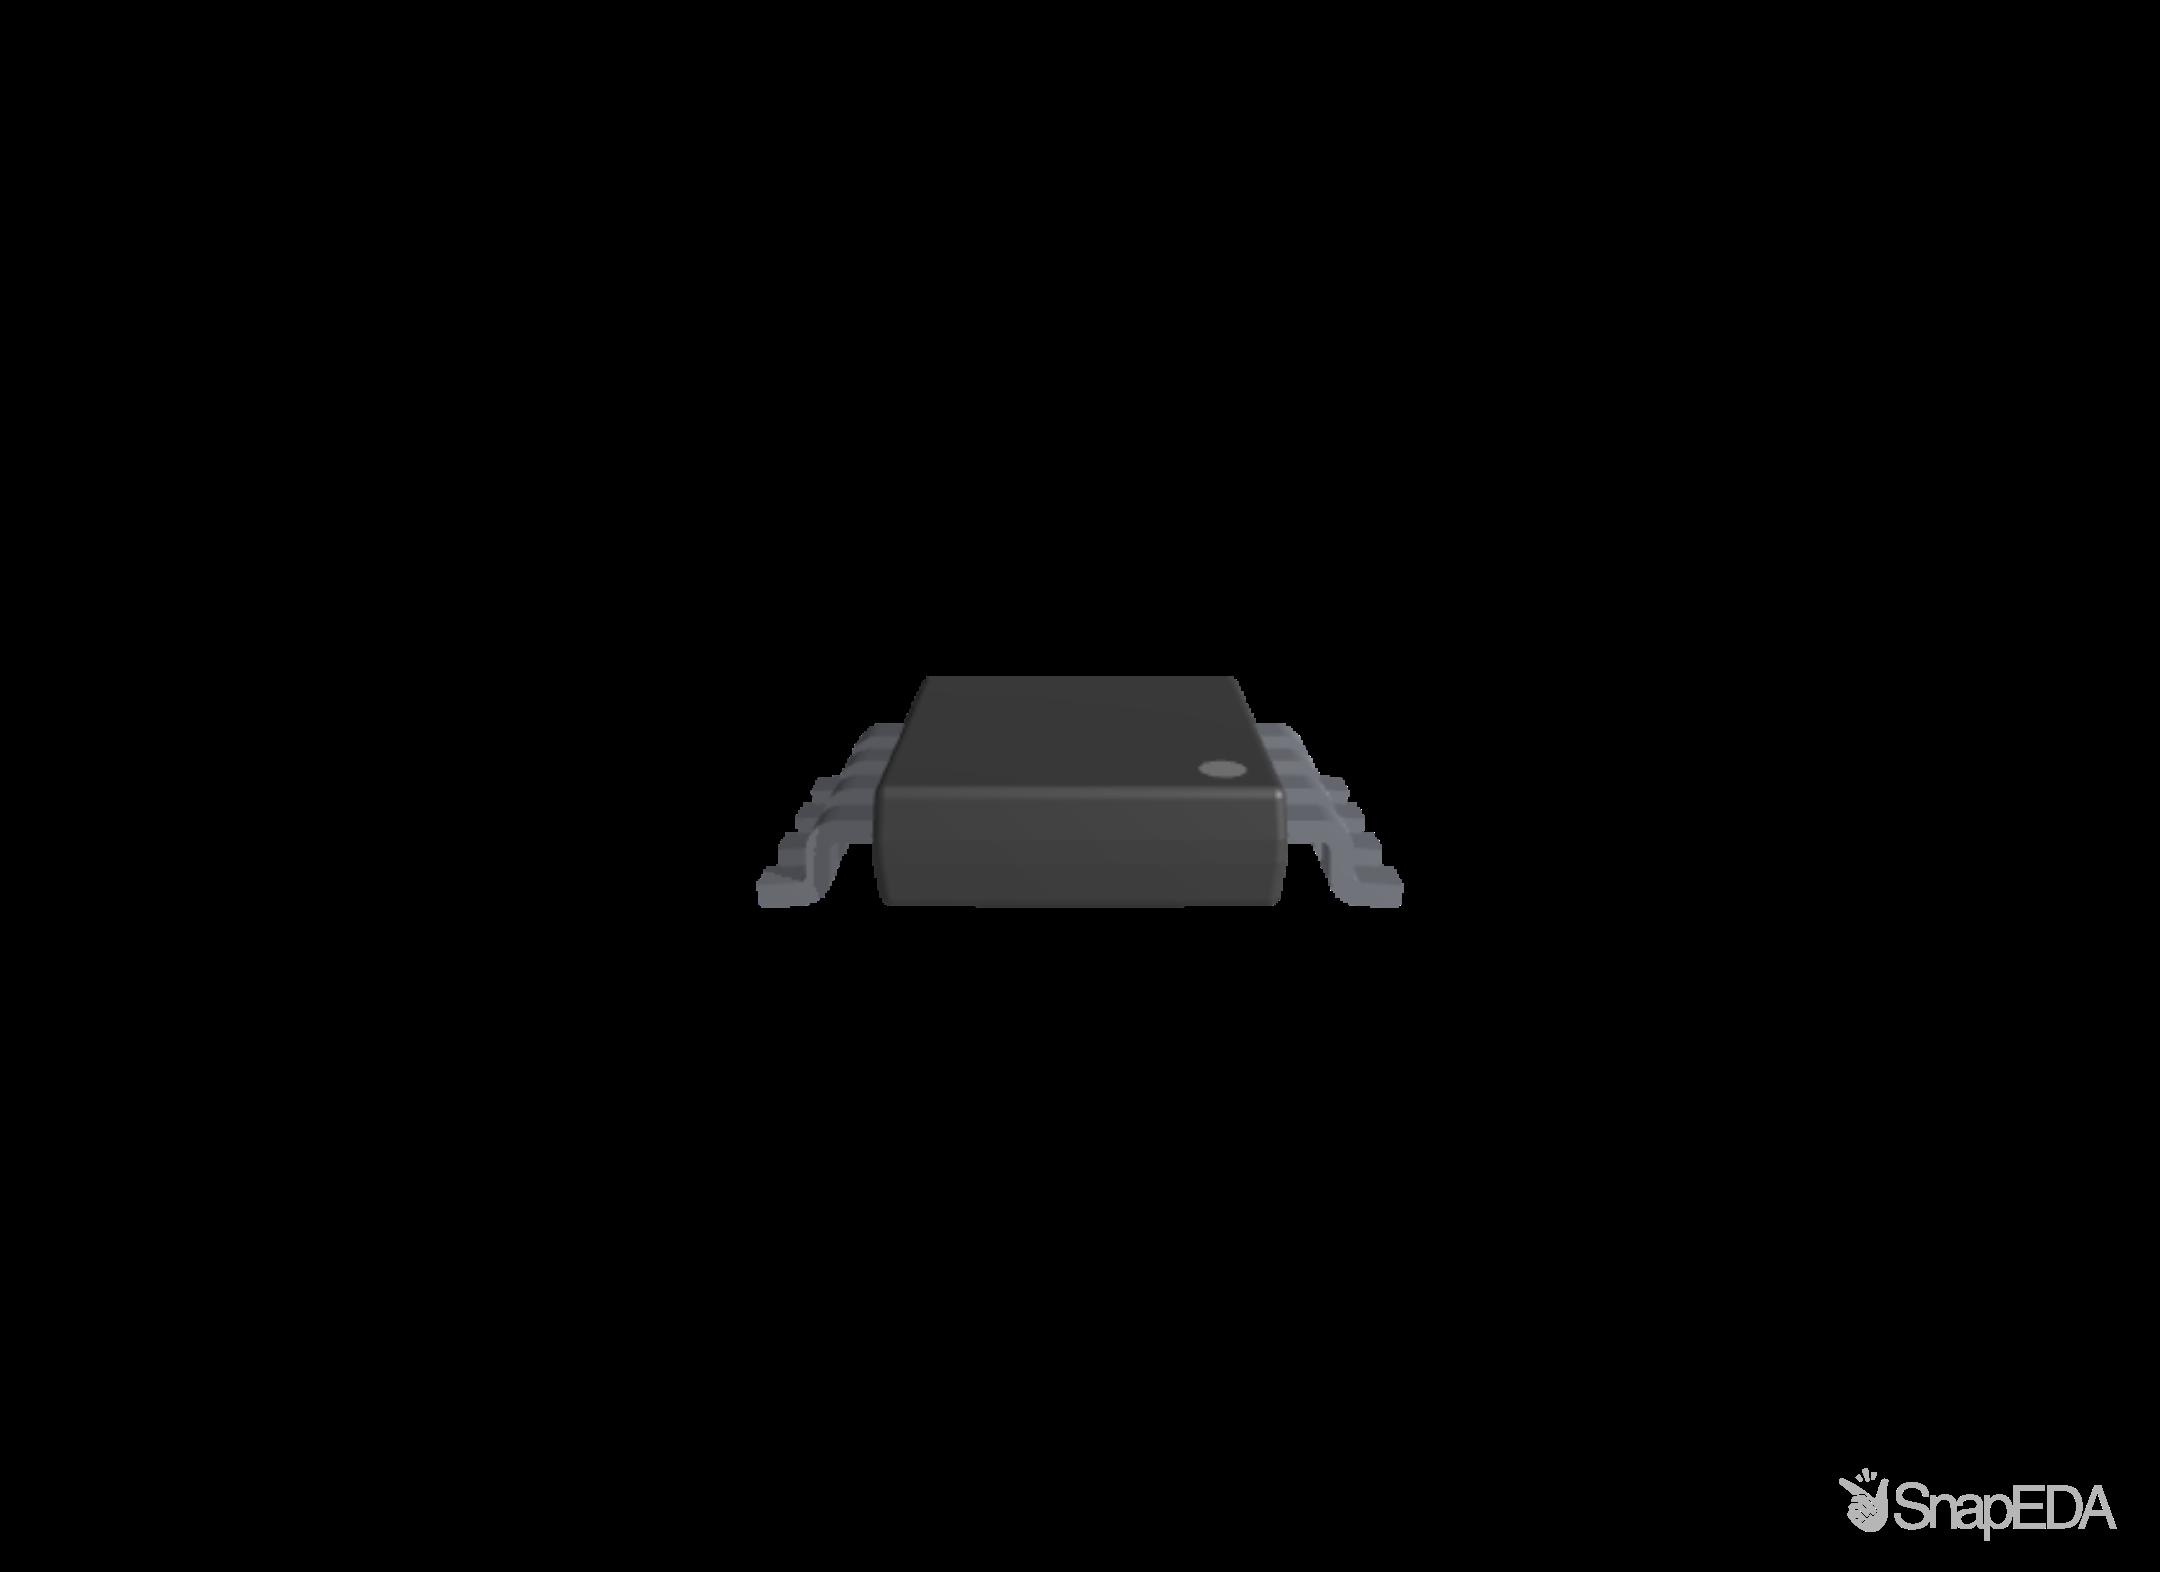 LMV358IDGKR 3D Model